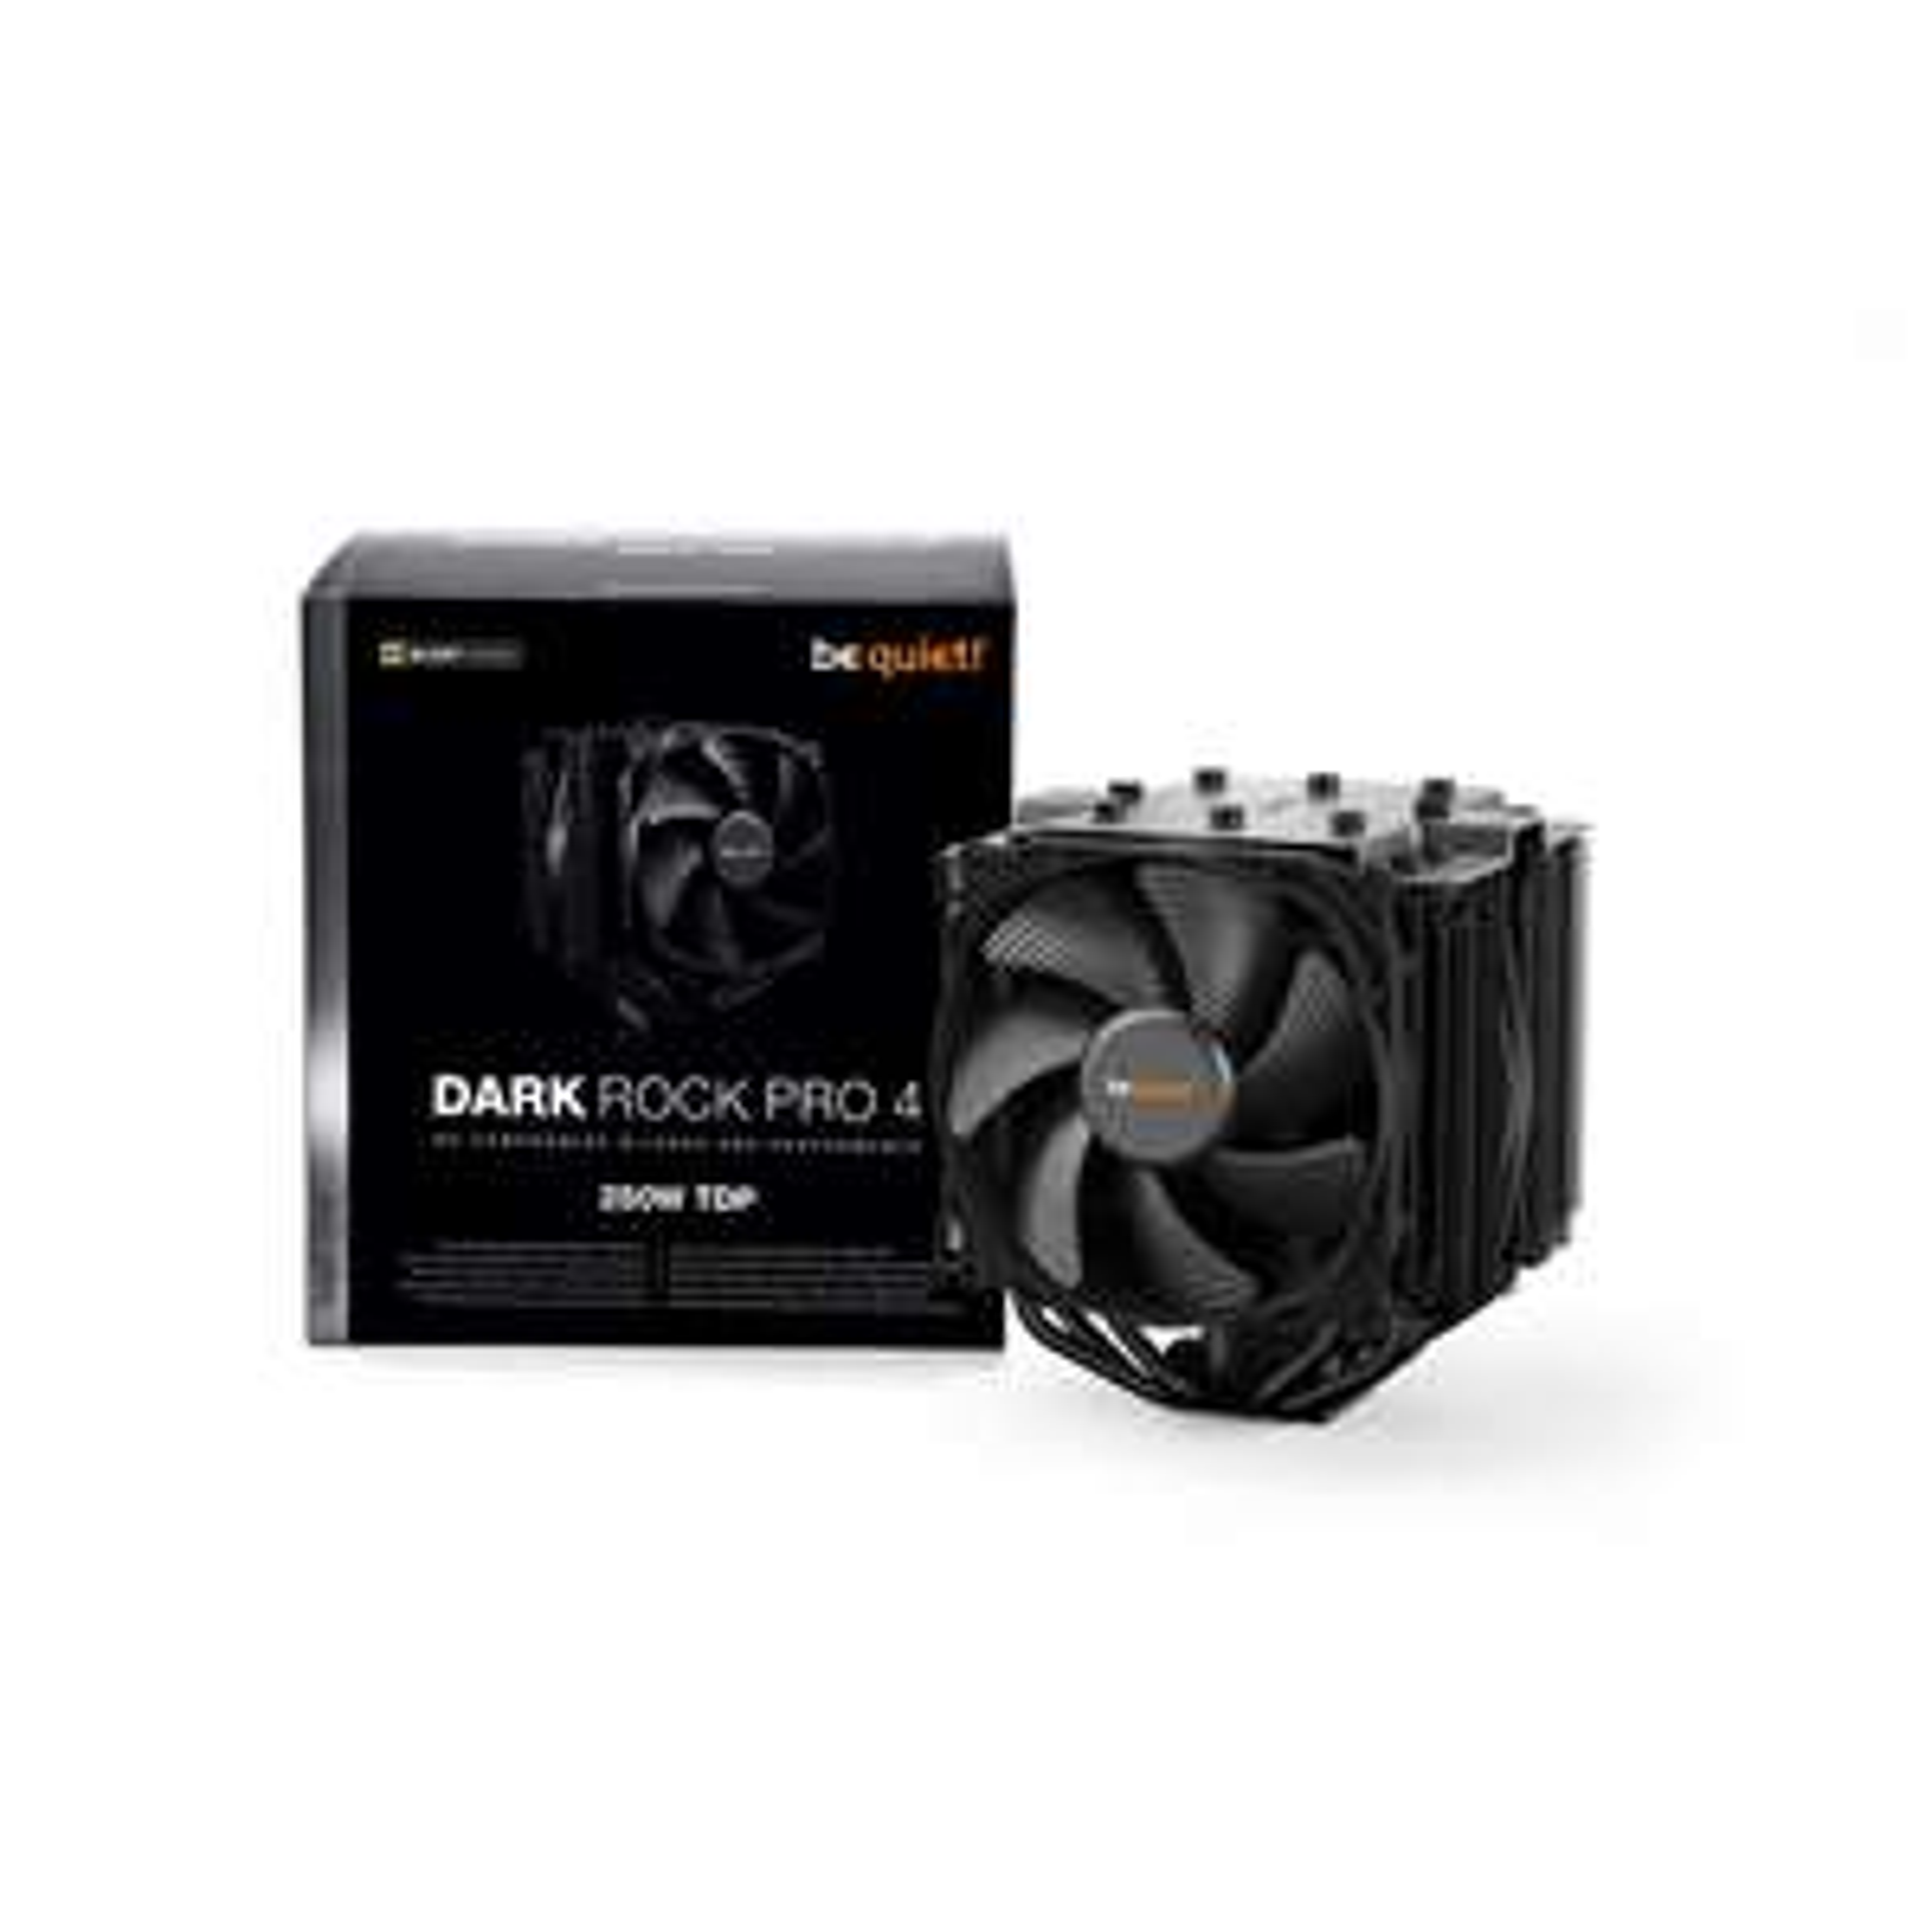 Be Quiet! Dark Rock Pro 4 CPU Air Tower Cooler £72.72 at CCLOnline